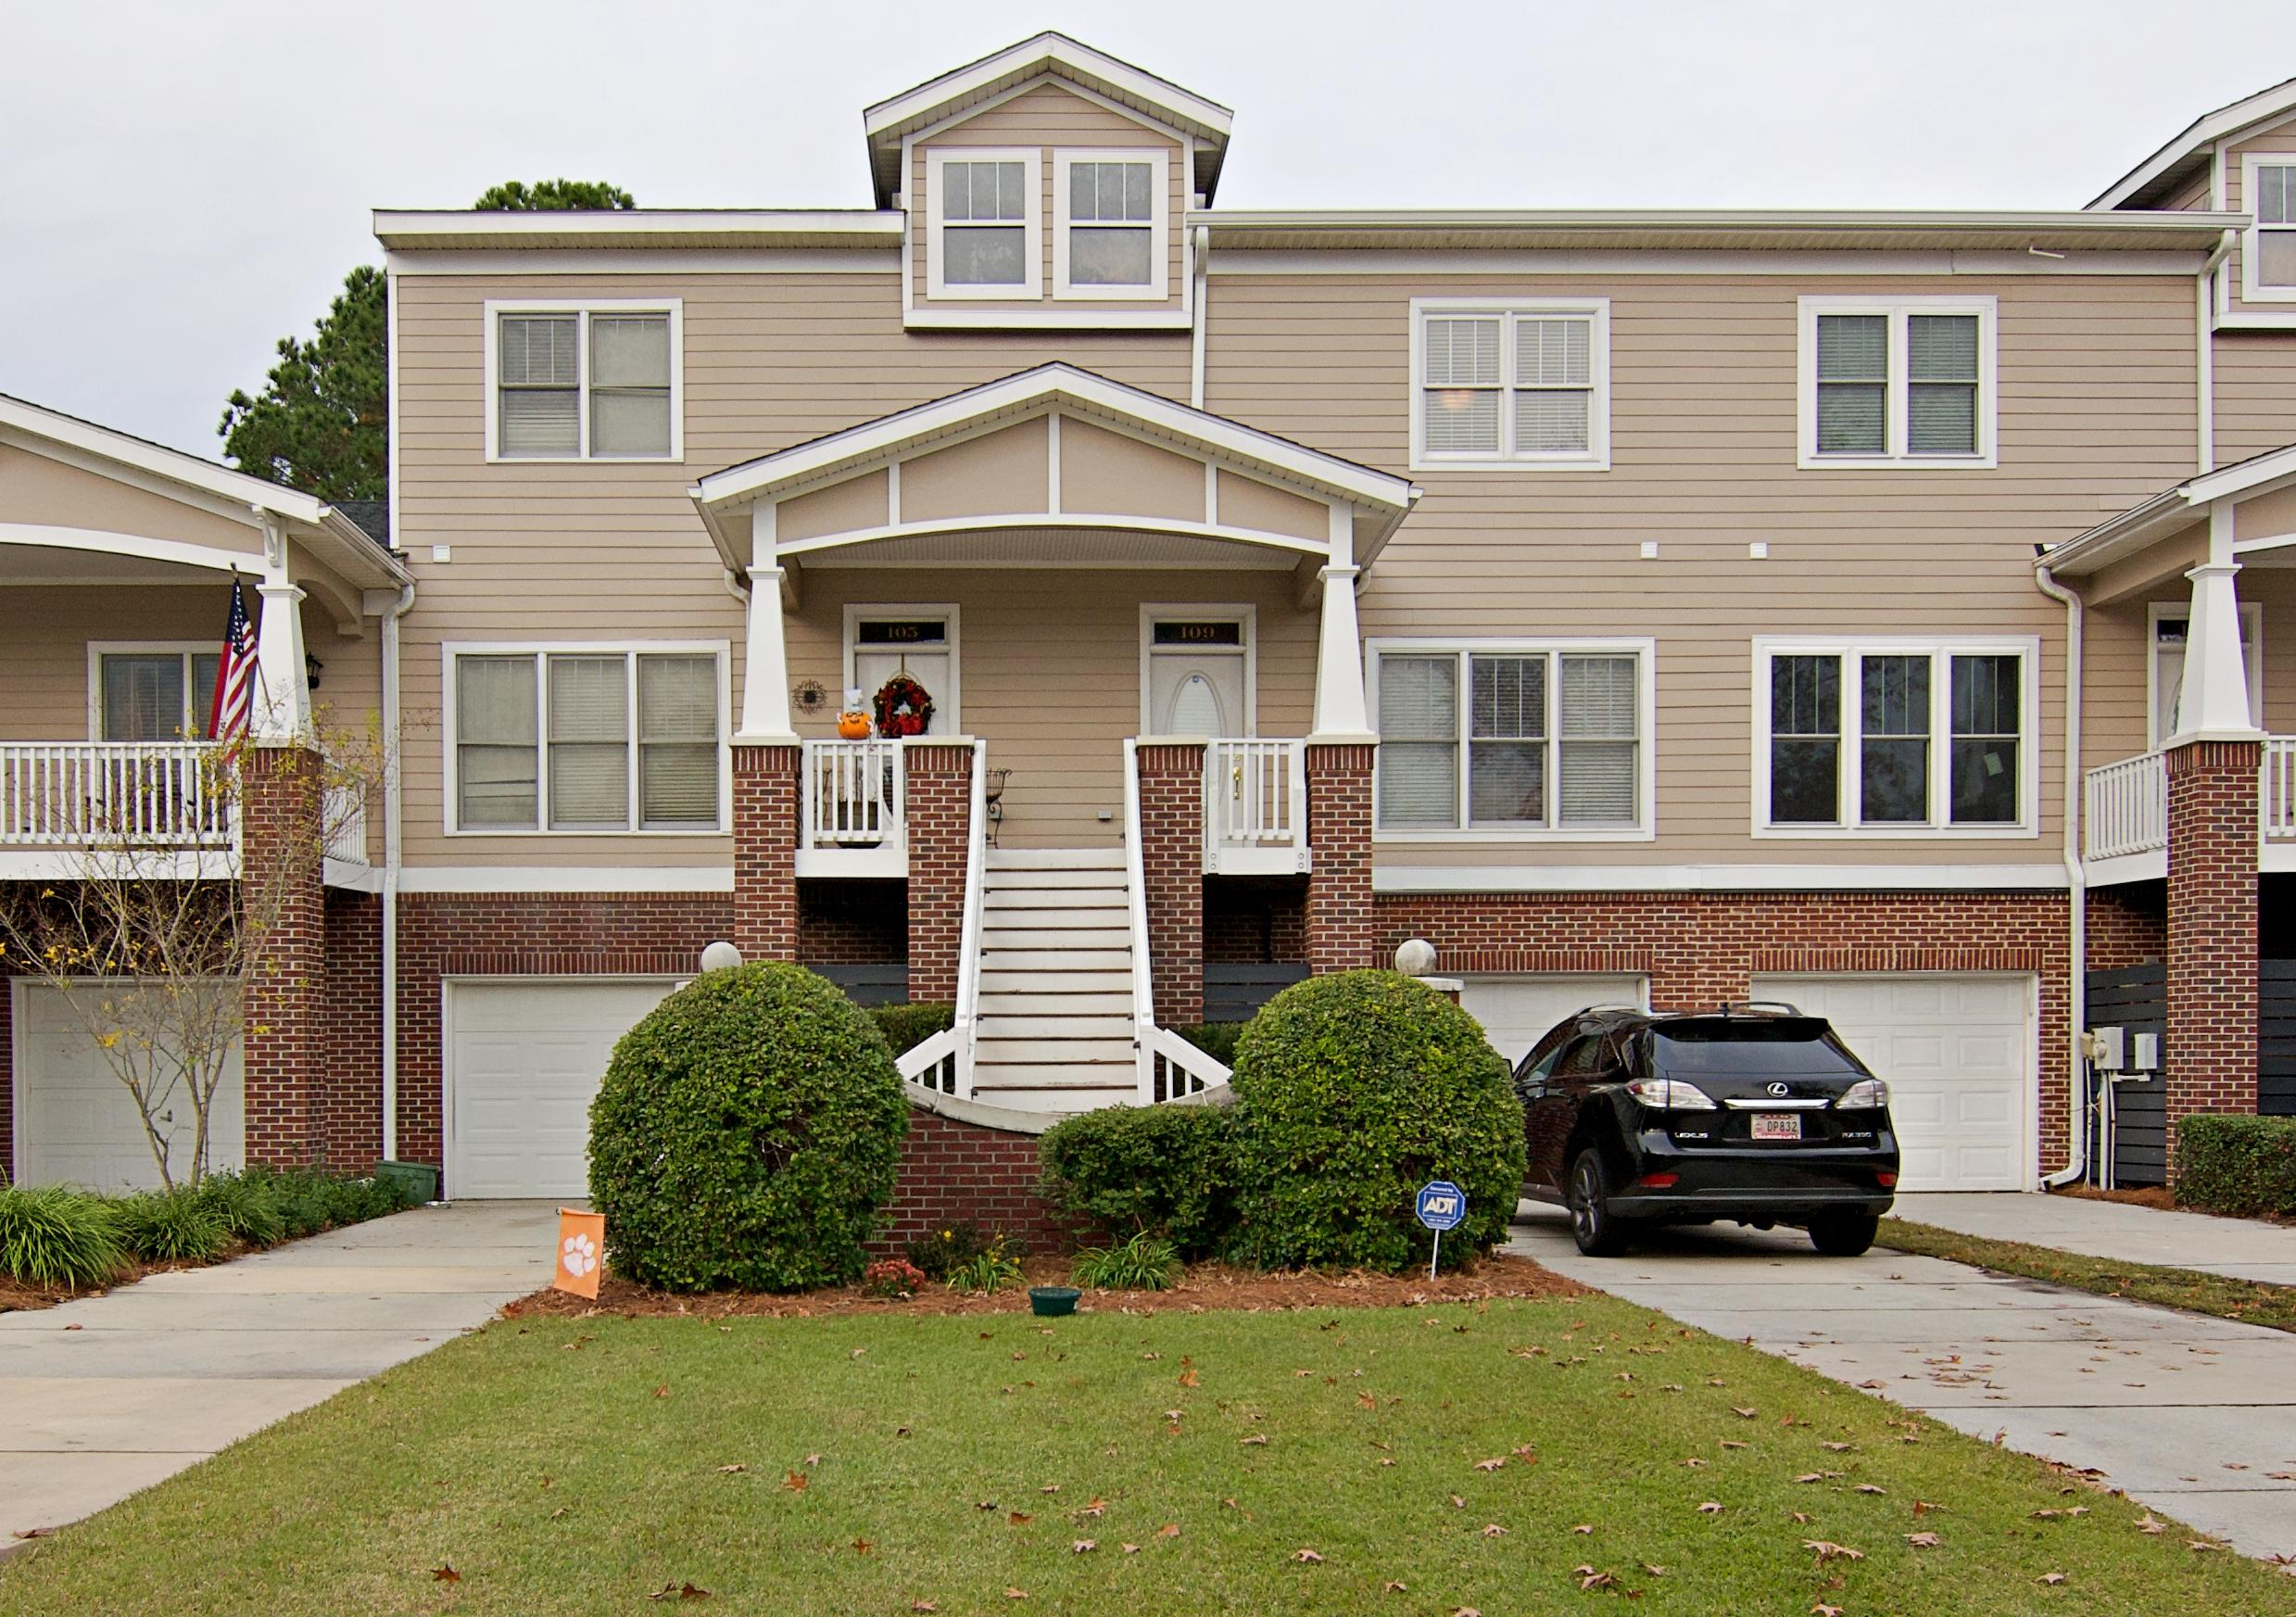 Etiwan Pointe Homes For Sale - 109 Etiwan Pointe, Mount Pleasant, SC - 31